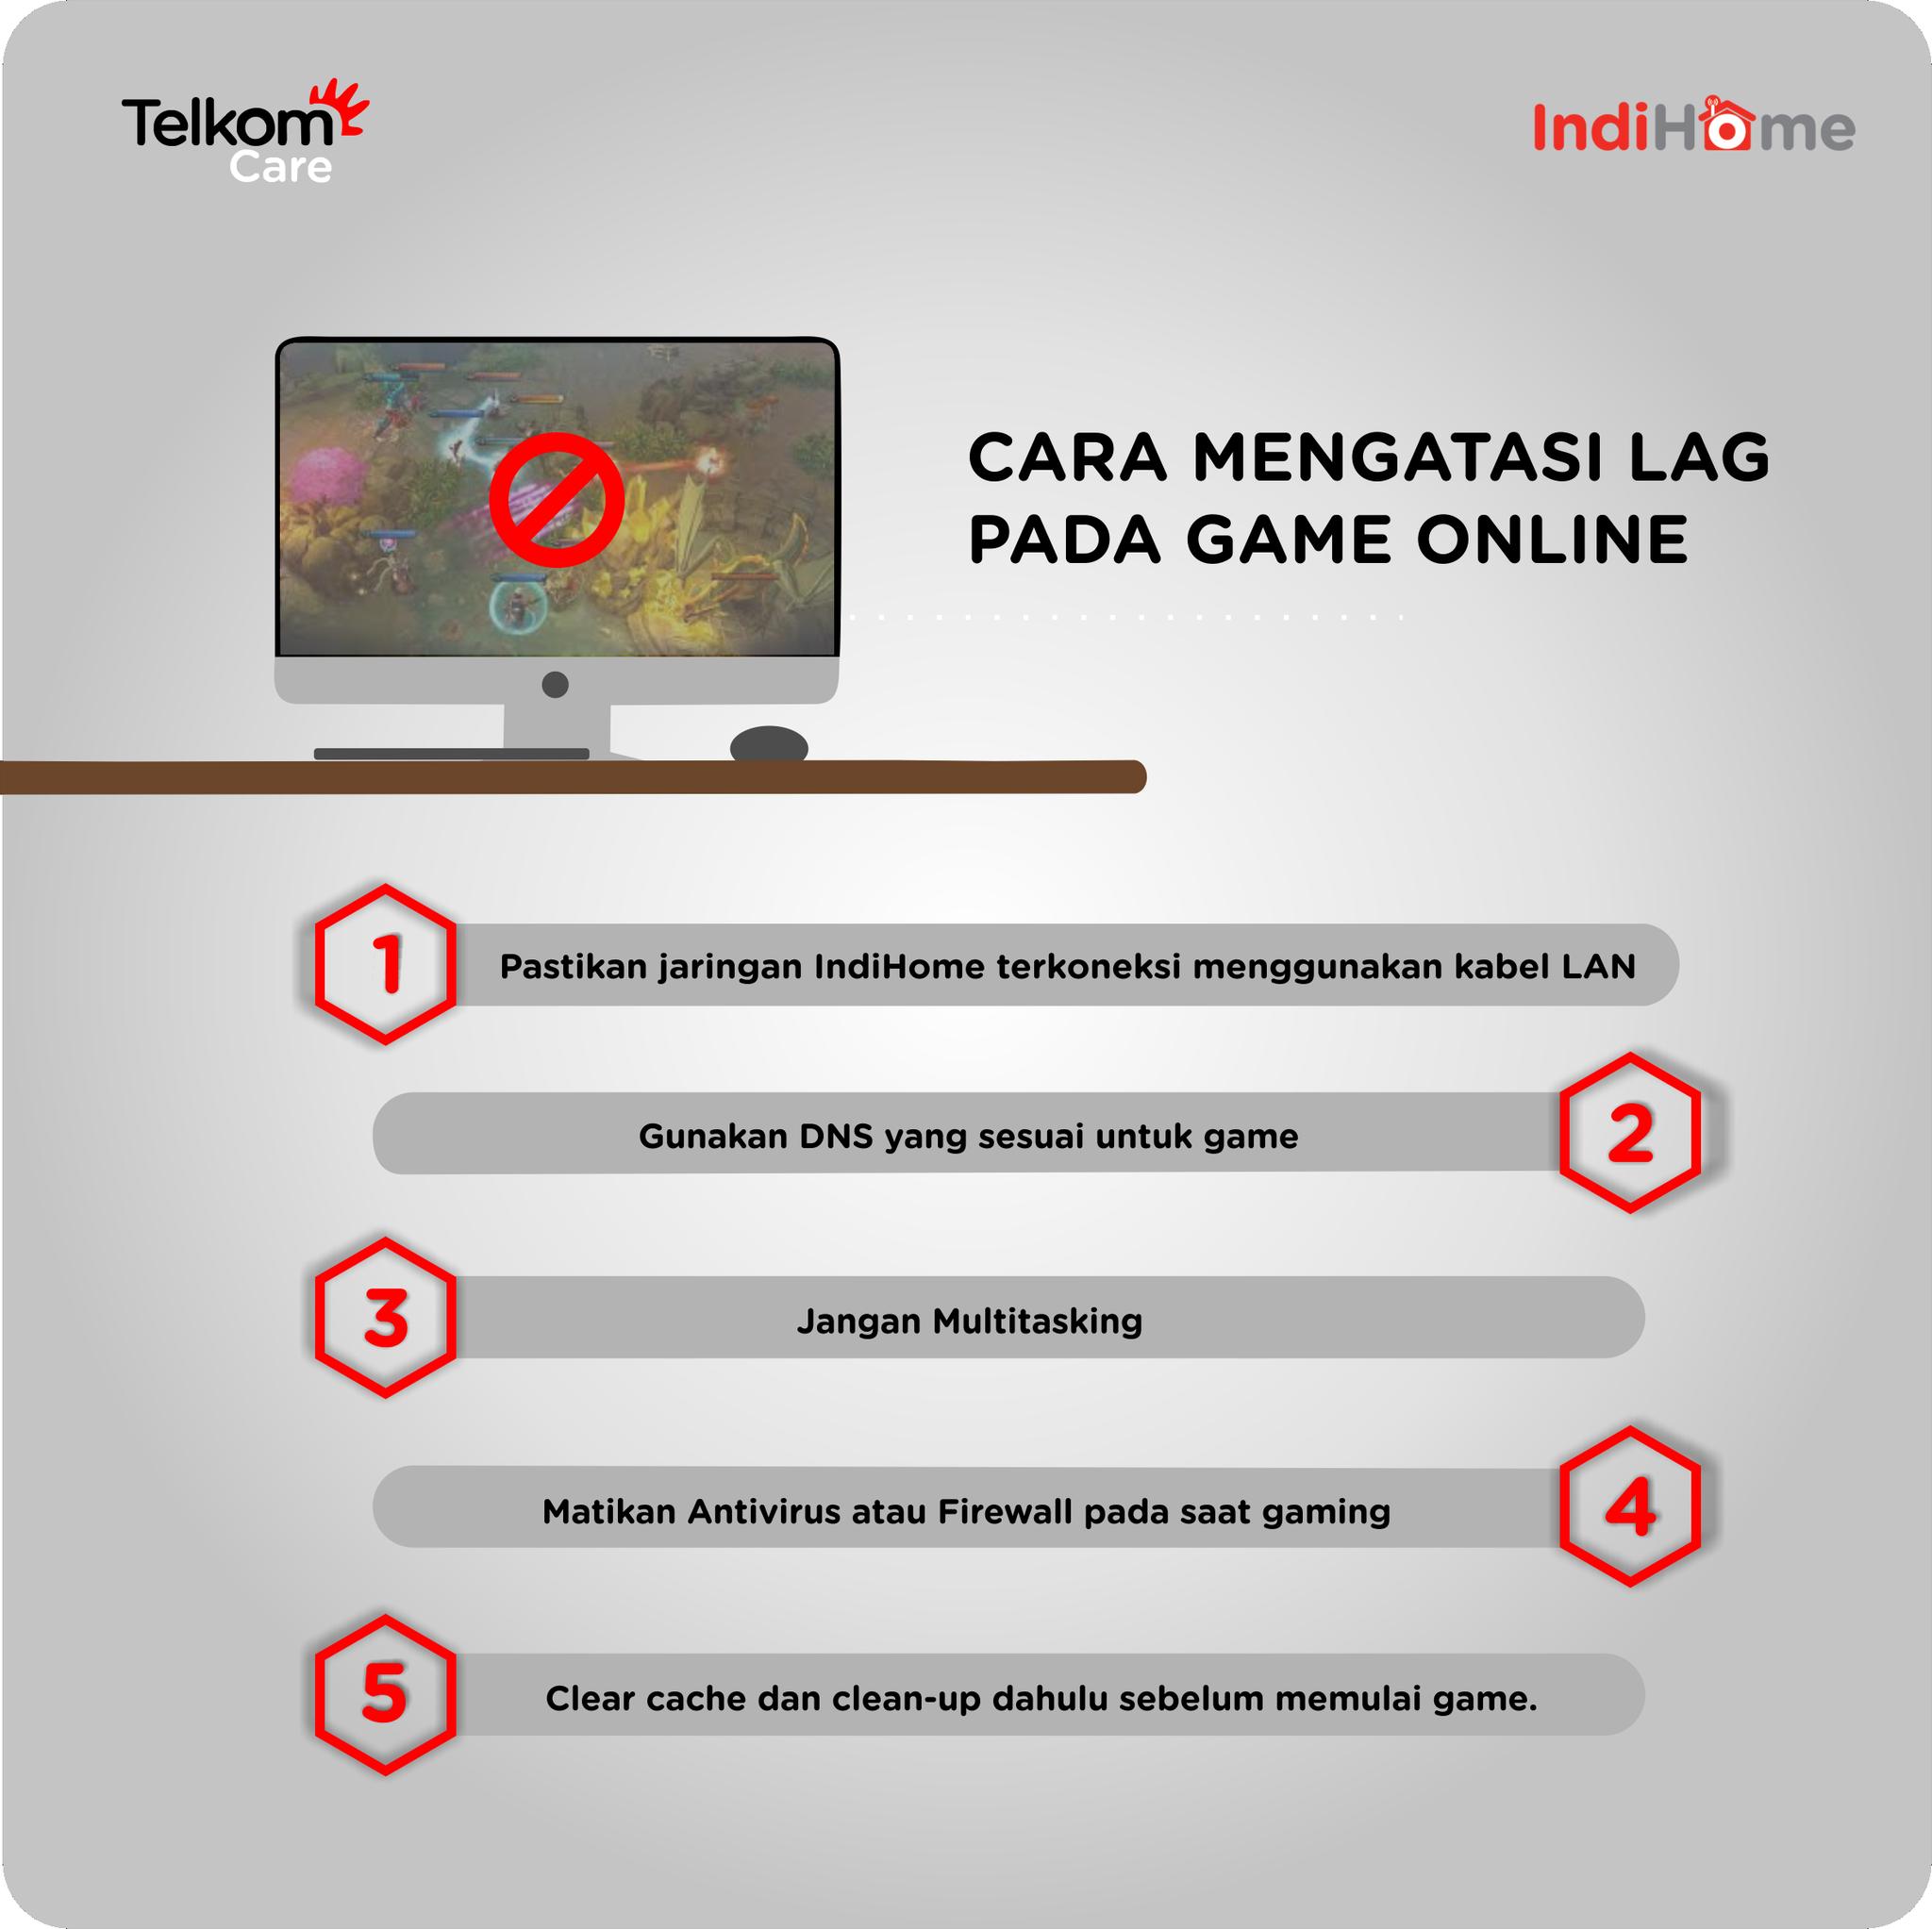 Telkom Care na Twitteru: